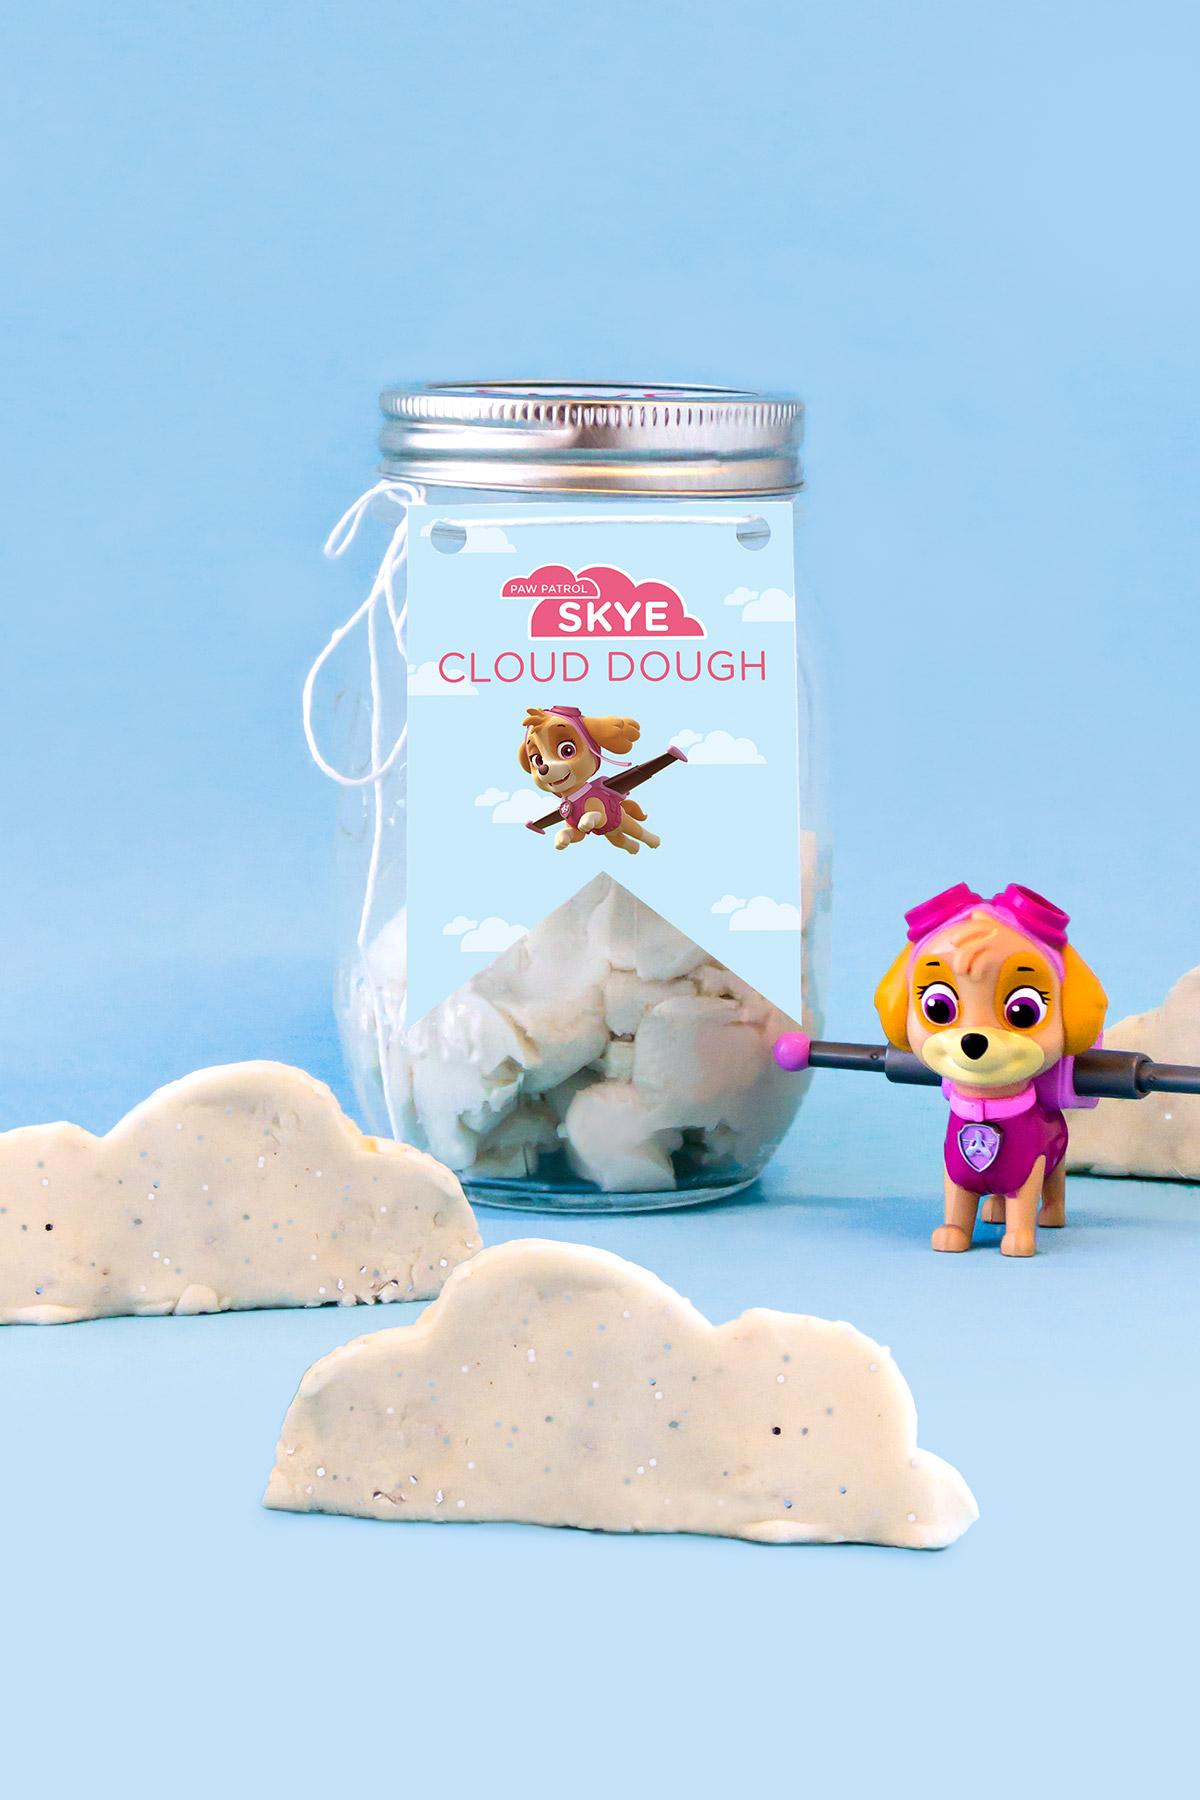 PAW Patrol Skye Cloud Dough